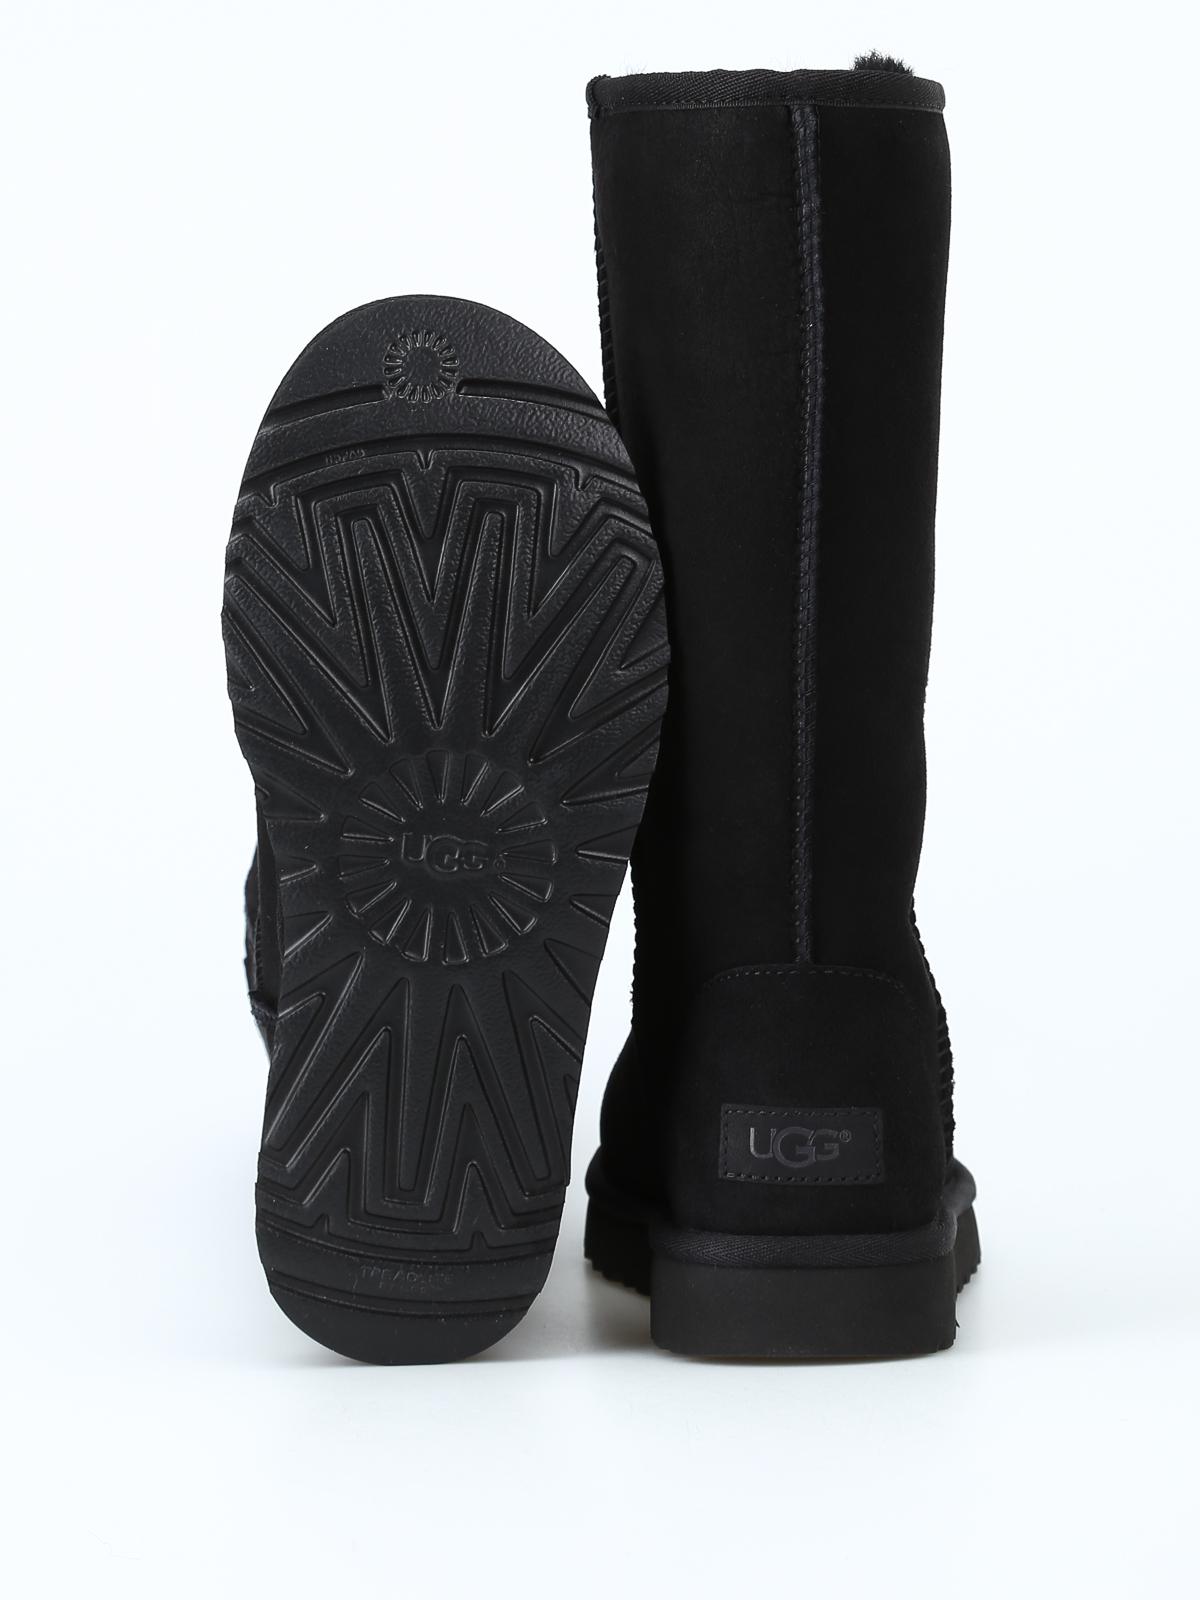 23f0c53d654 Ugg - Classic Tall II black boots - boots - 1016224 BLACK   iKRIX.com